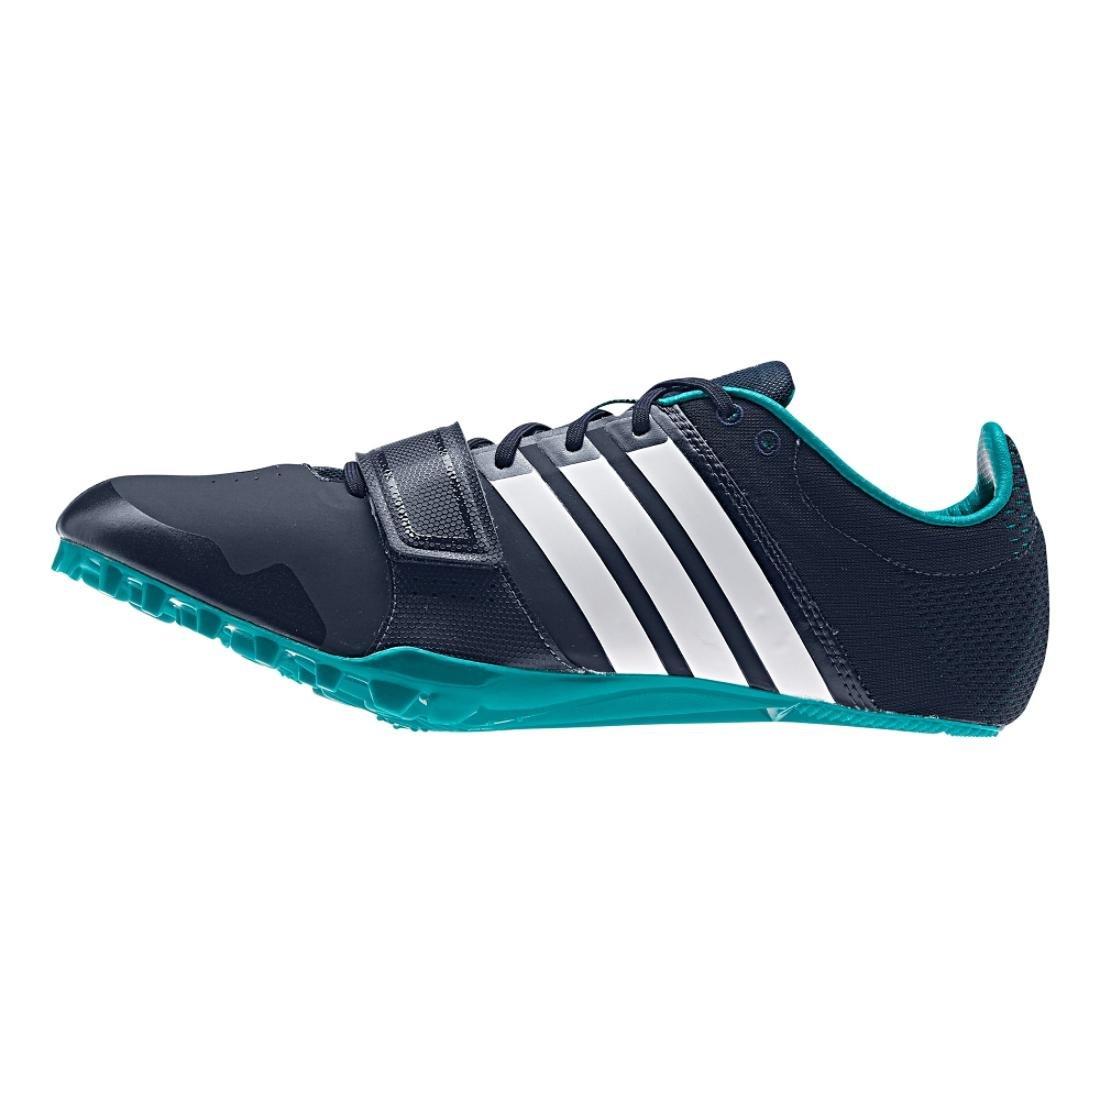 Adidas Originalsadizero Accelerator-U - Adizero Accelerator-u Unisex-Erwachsene